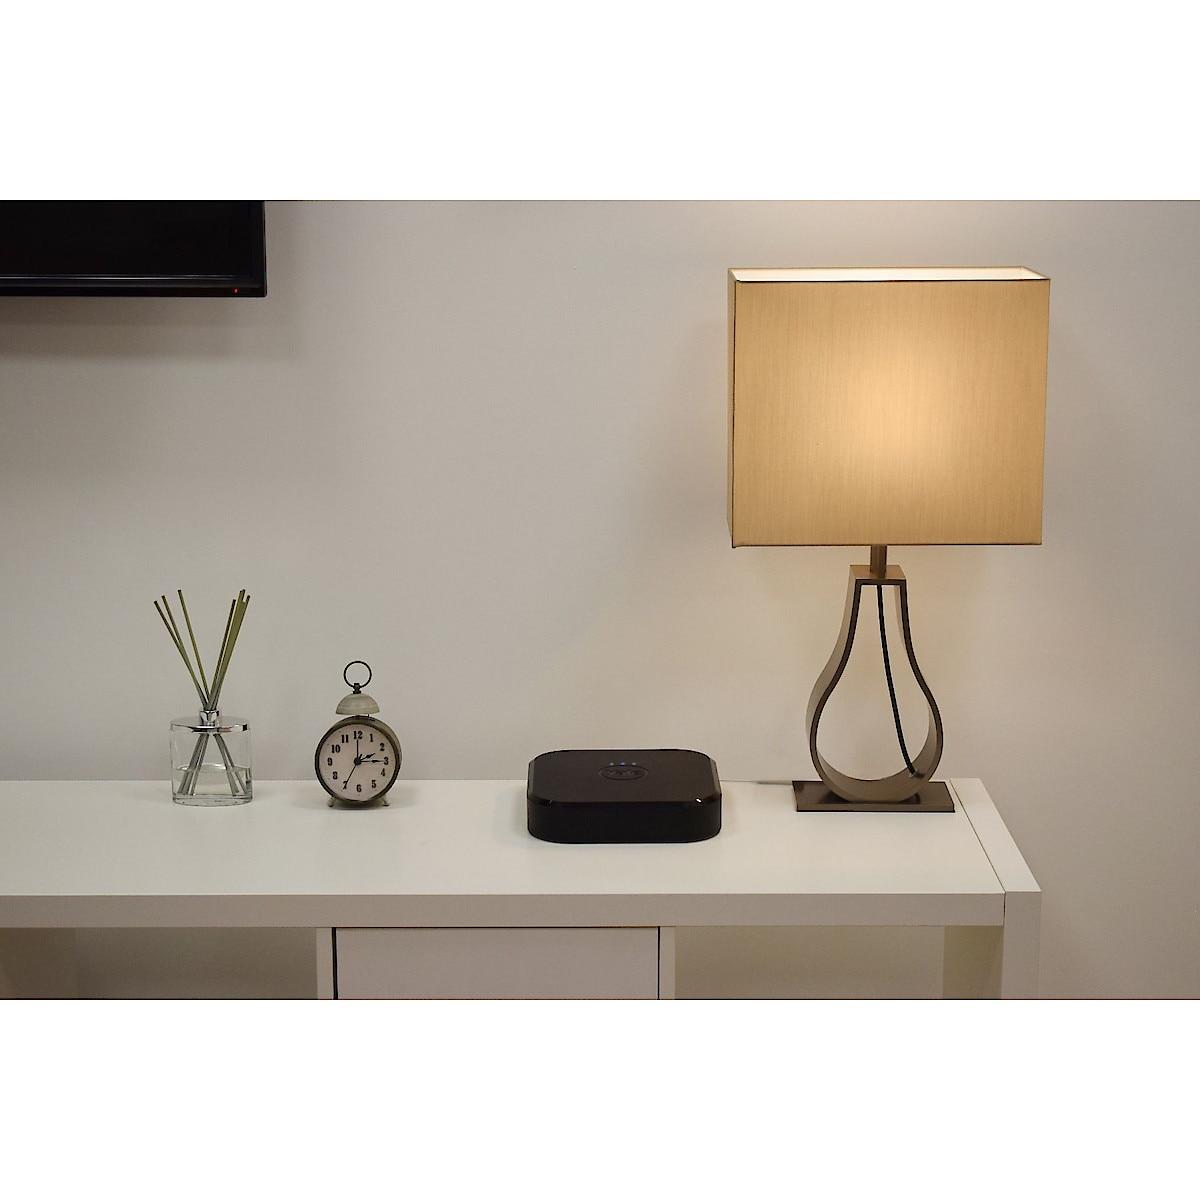 Yale Smart Home 2-Camera CCTV Kit